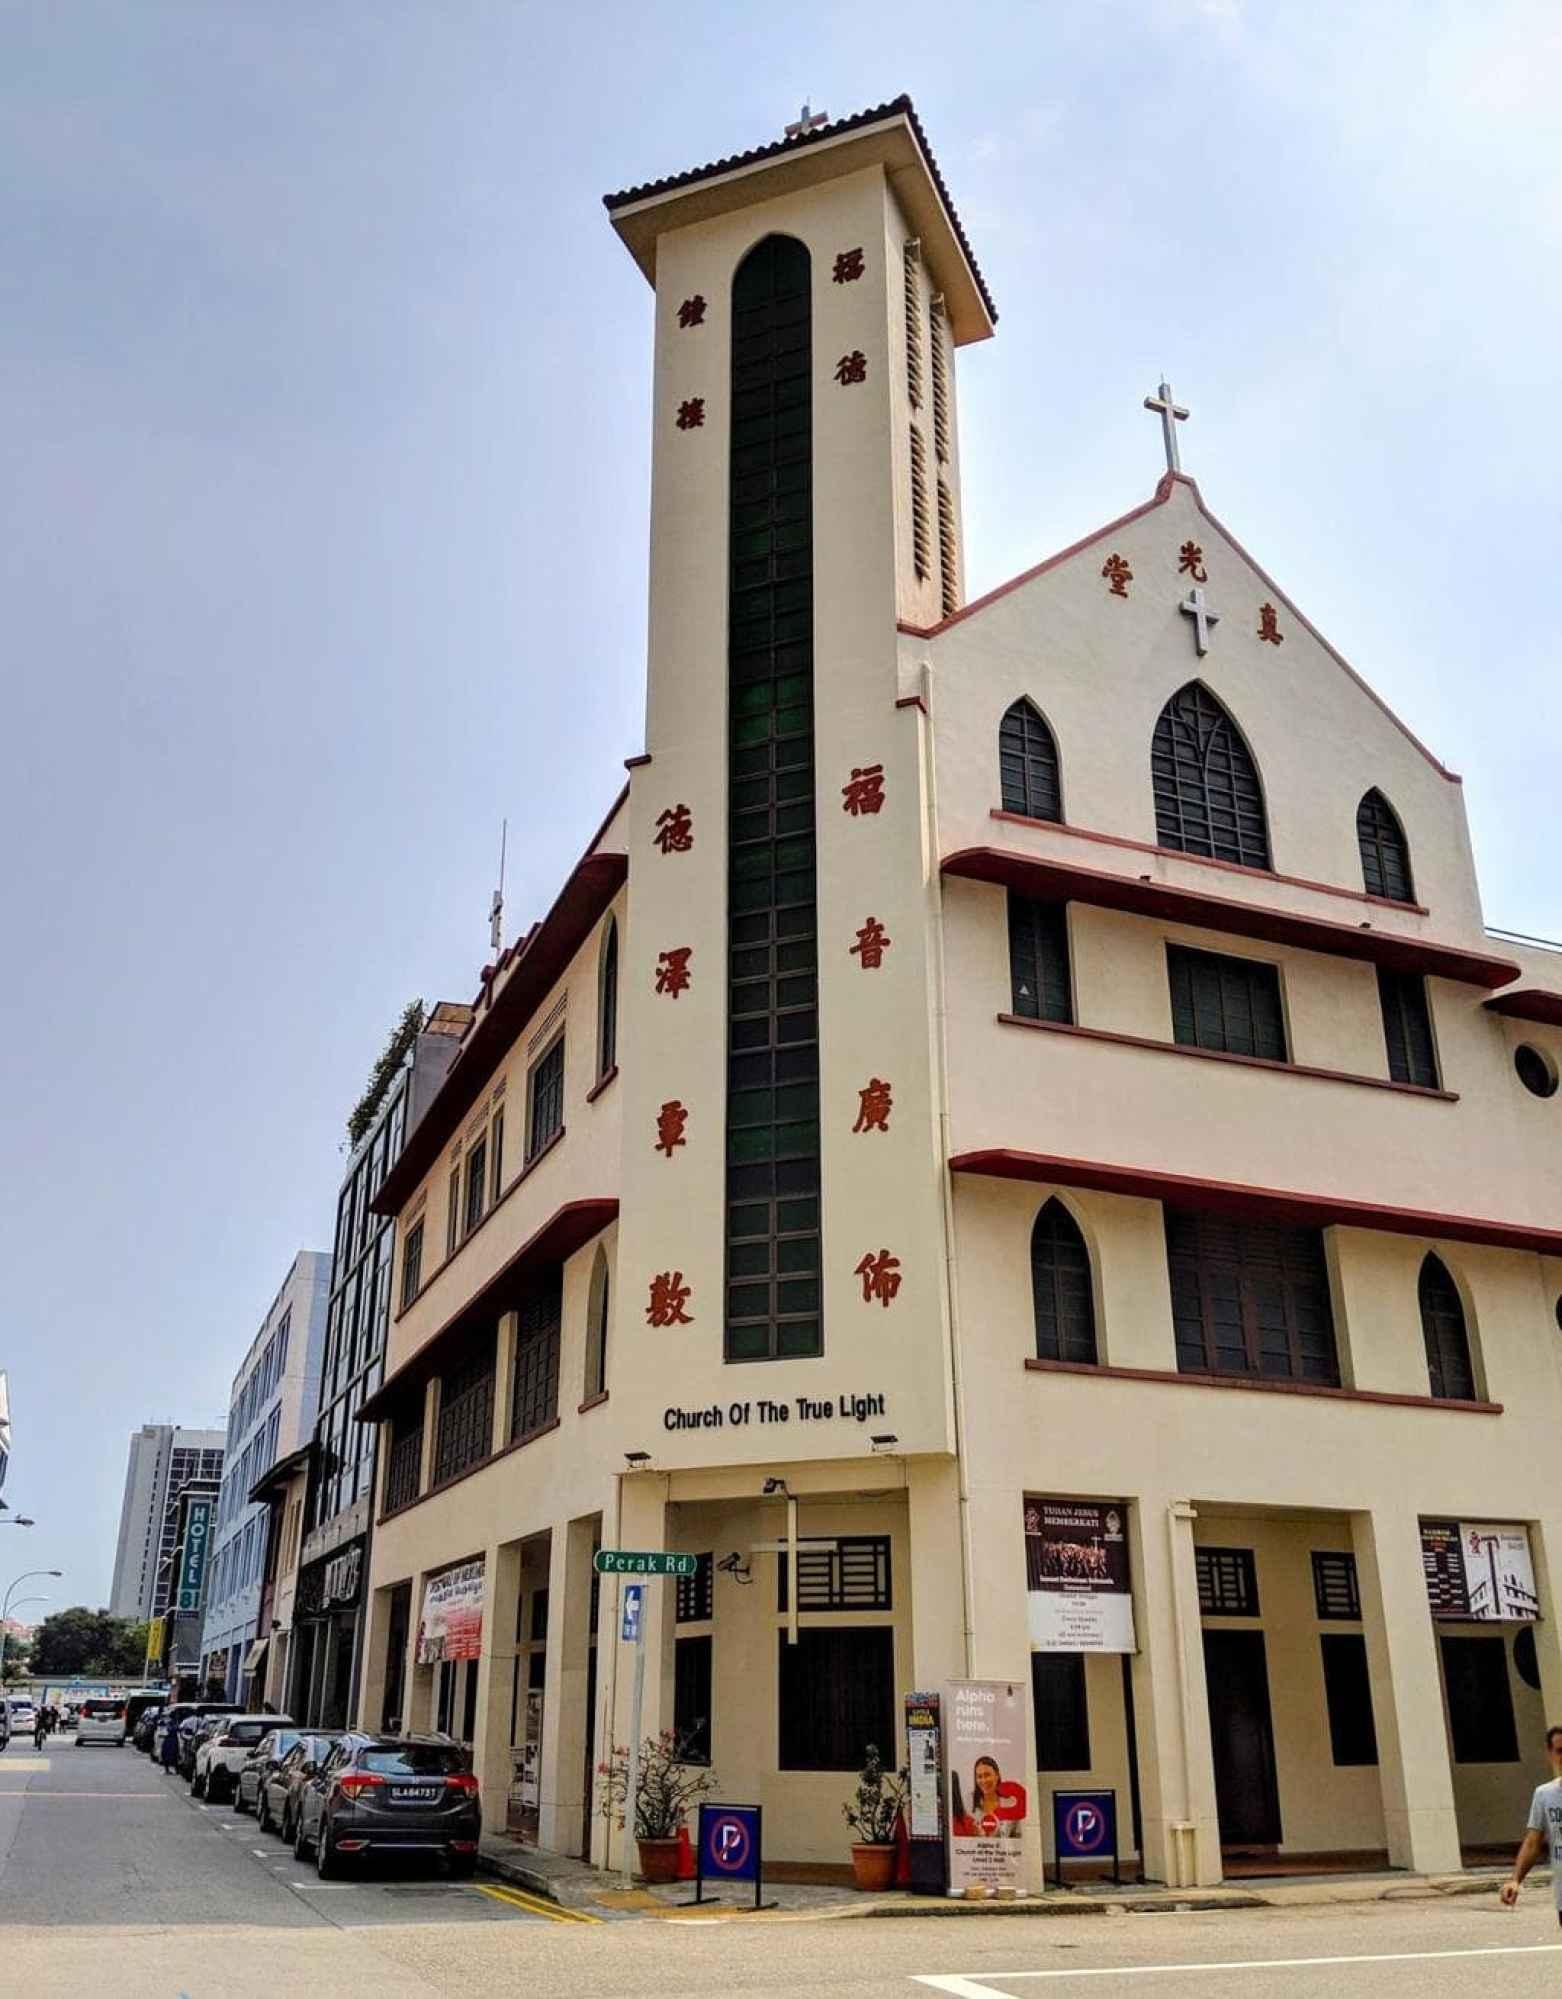 Church of the True Light